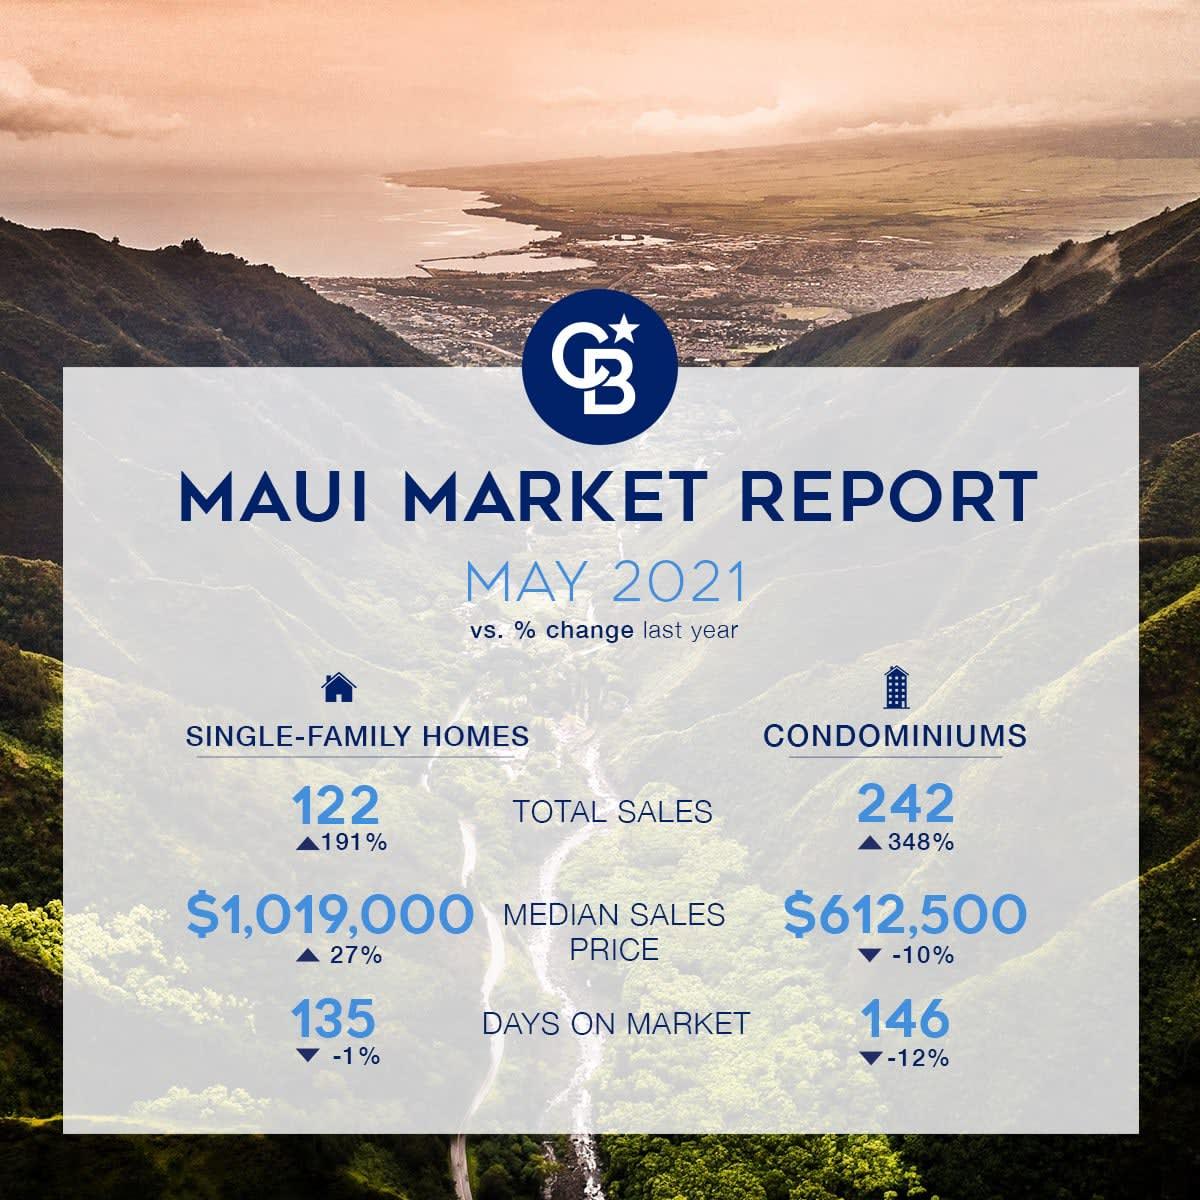 Maui Market Report, May 2021